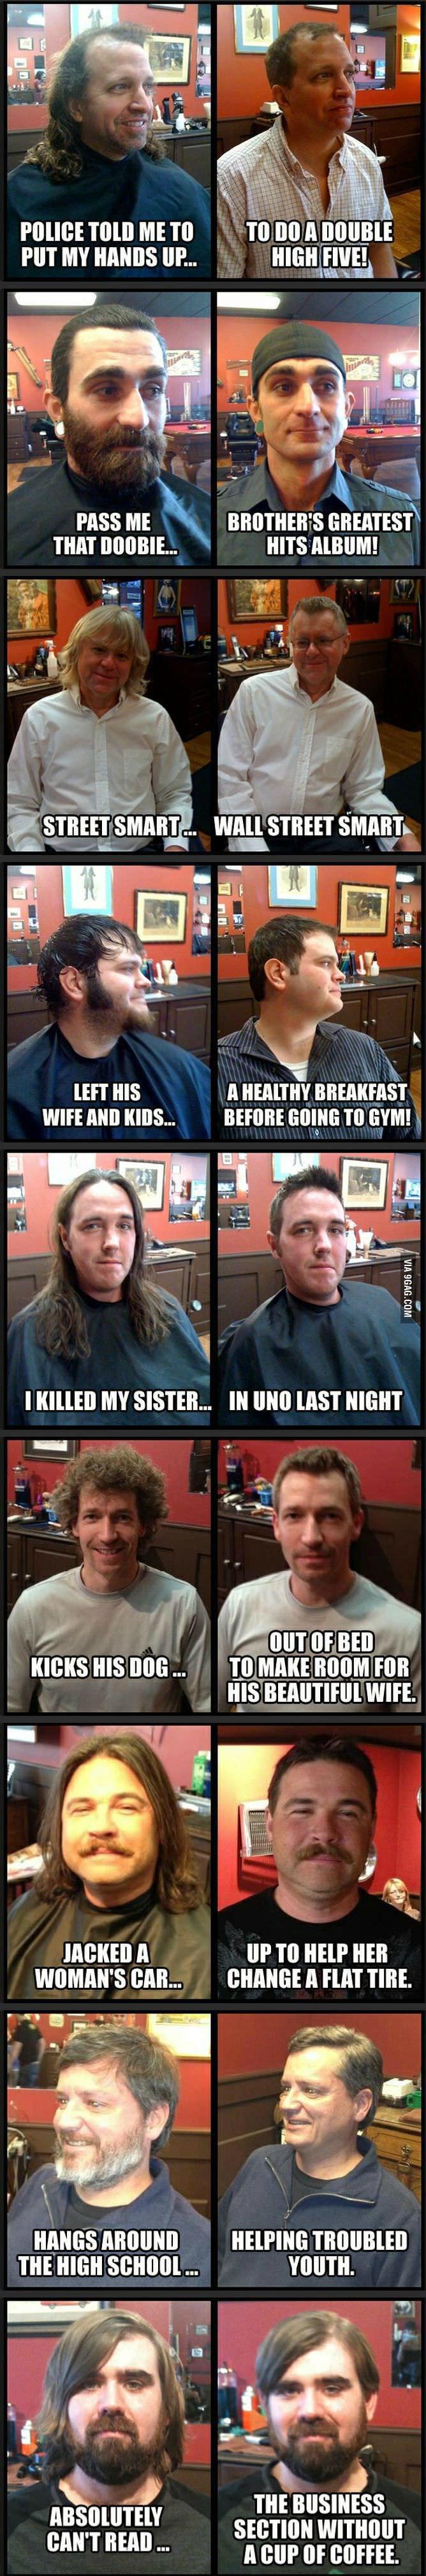 "Haircut. . rolls: mm ME TO I II] no [ PASS ME i, THAT ... HITS mum! HIS A BREAKFAST WIFE Mil KRIS... REFINE Mi, rla TO GYM! A Inna VIA I I MY SISTER... lit ""III"